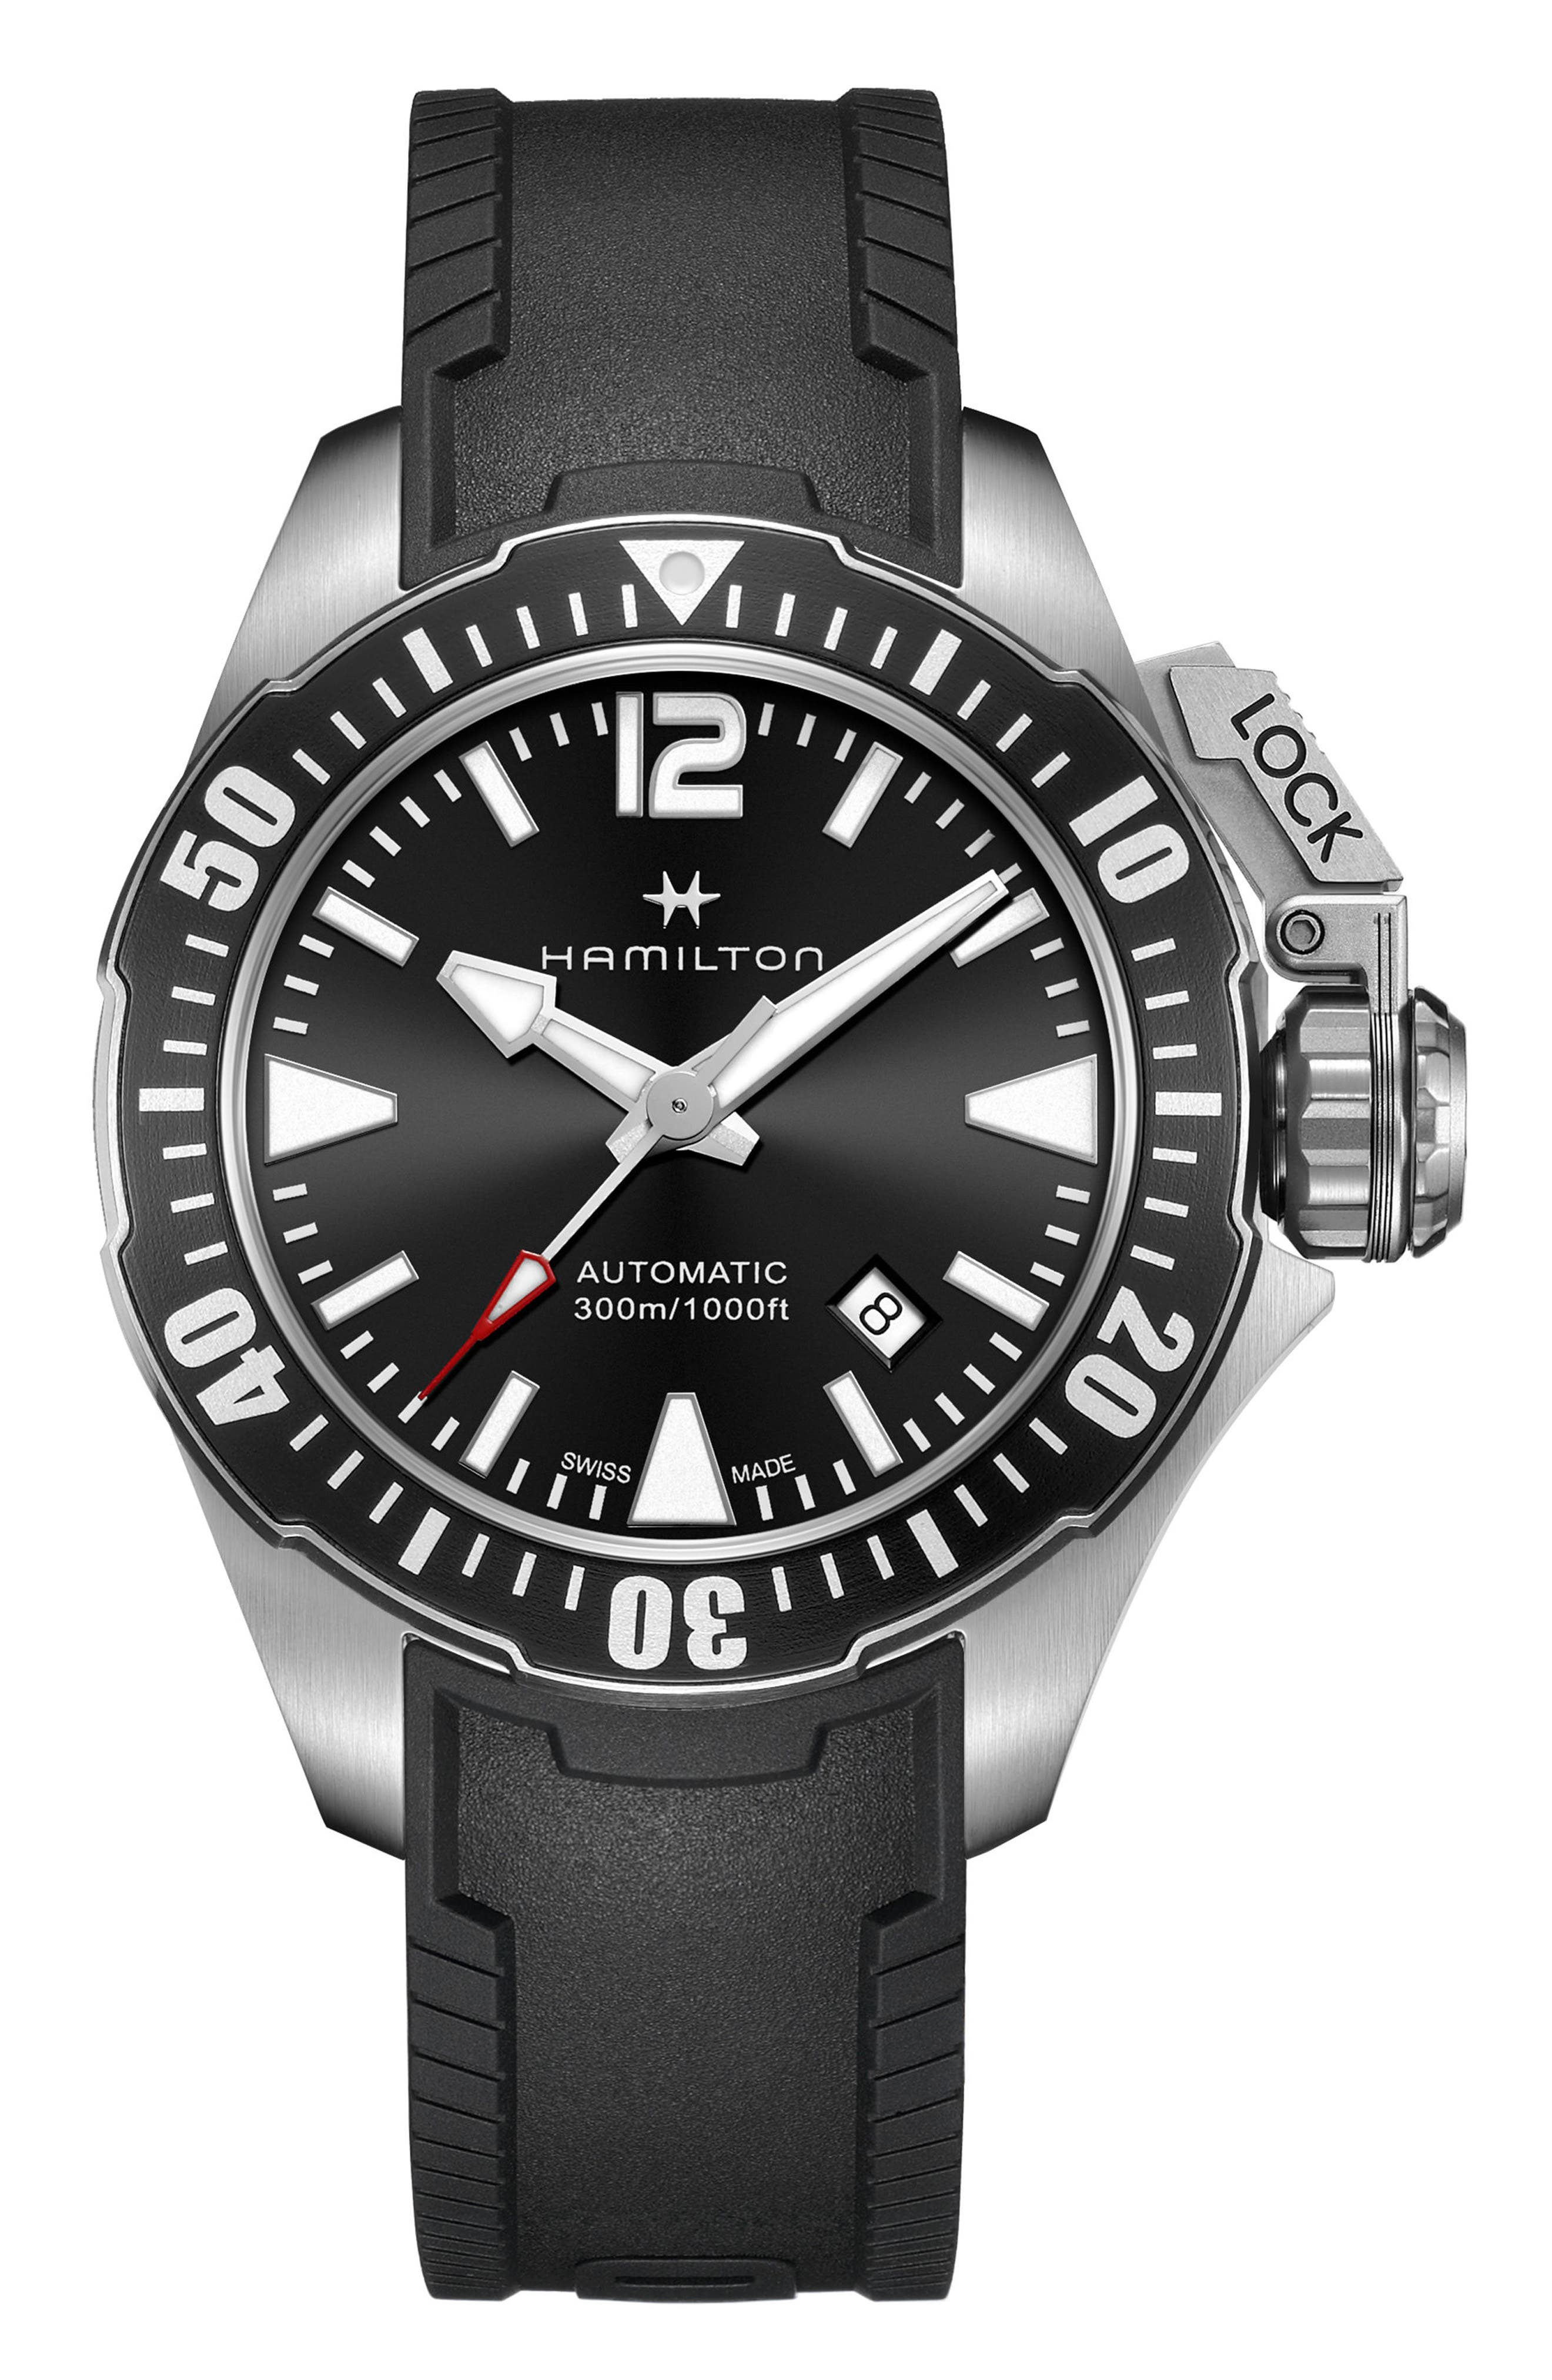 HAMILTON Khaki Navy Frogman Automatic Silicone Strap Watch, 42mm, Main, color, 001